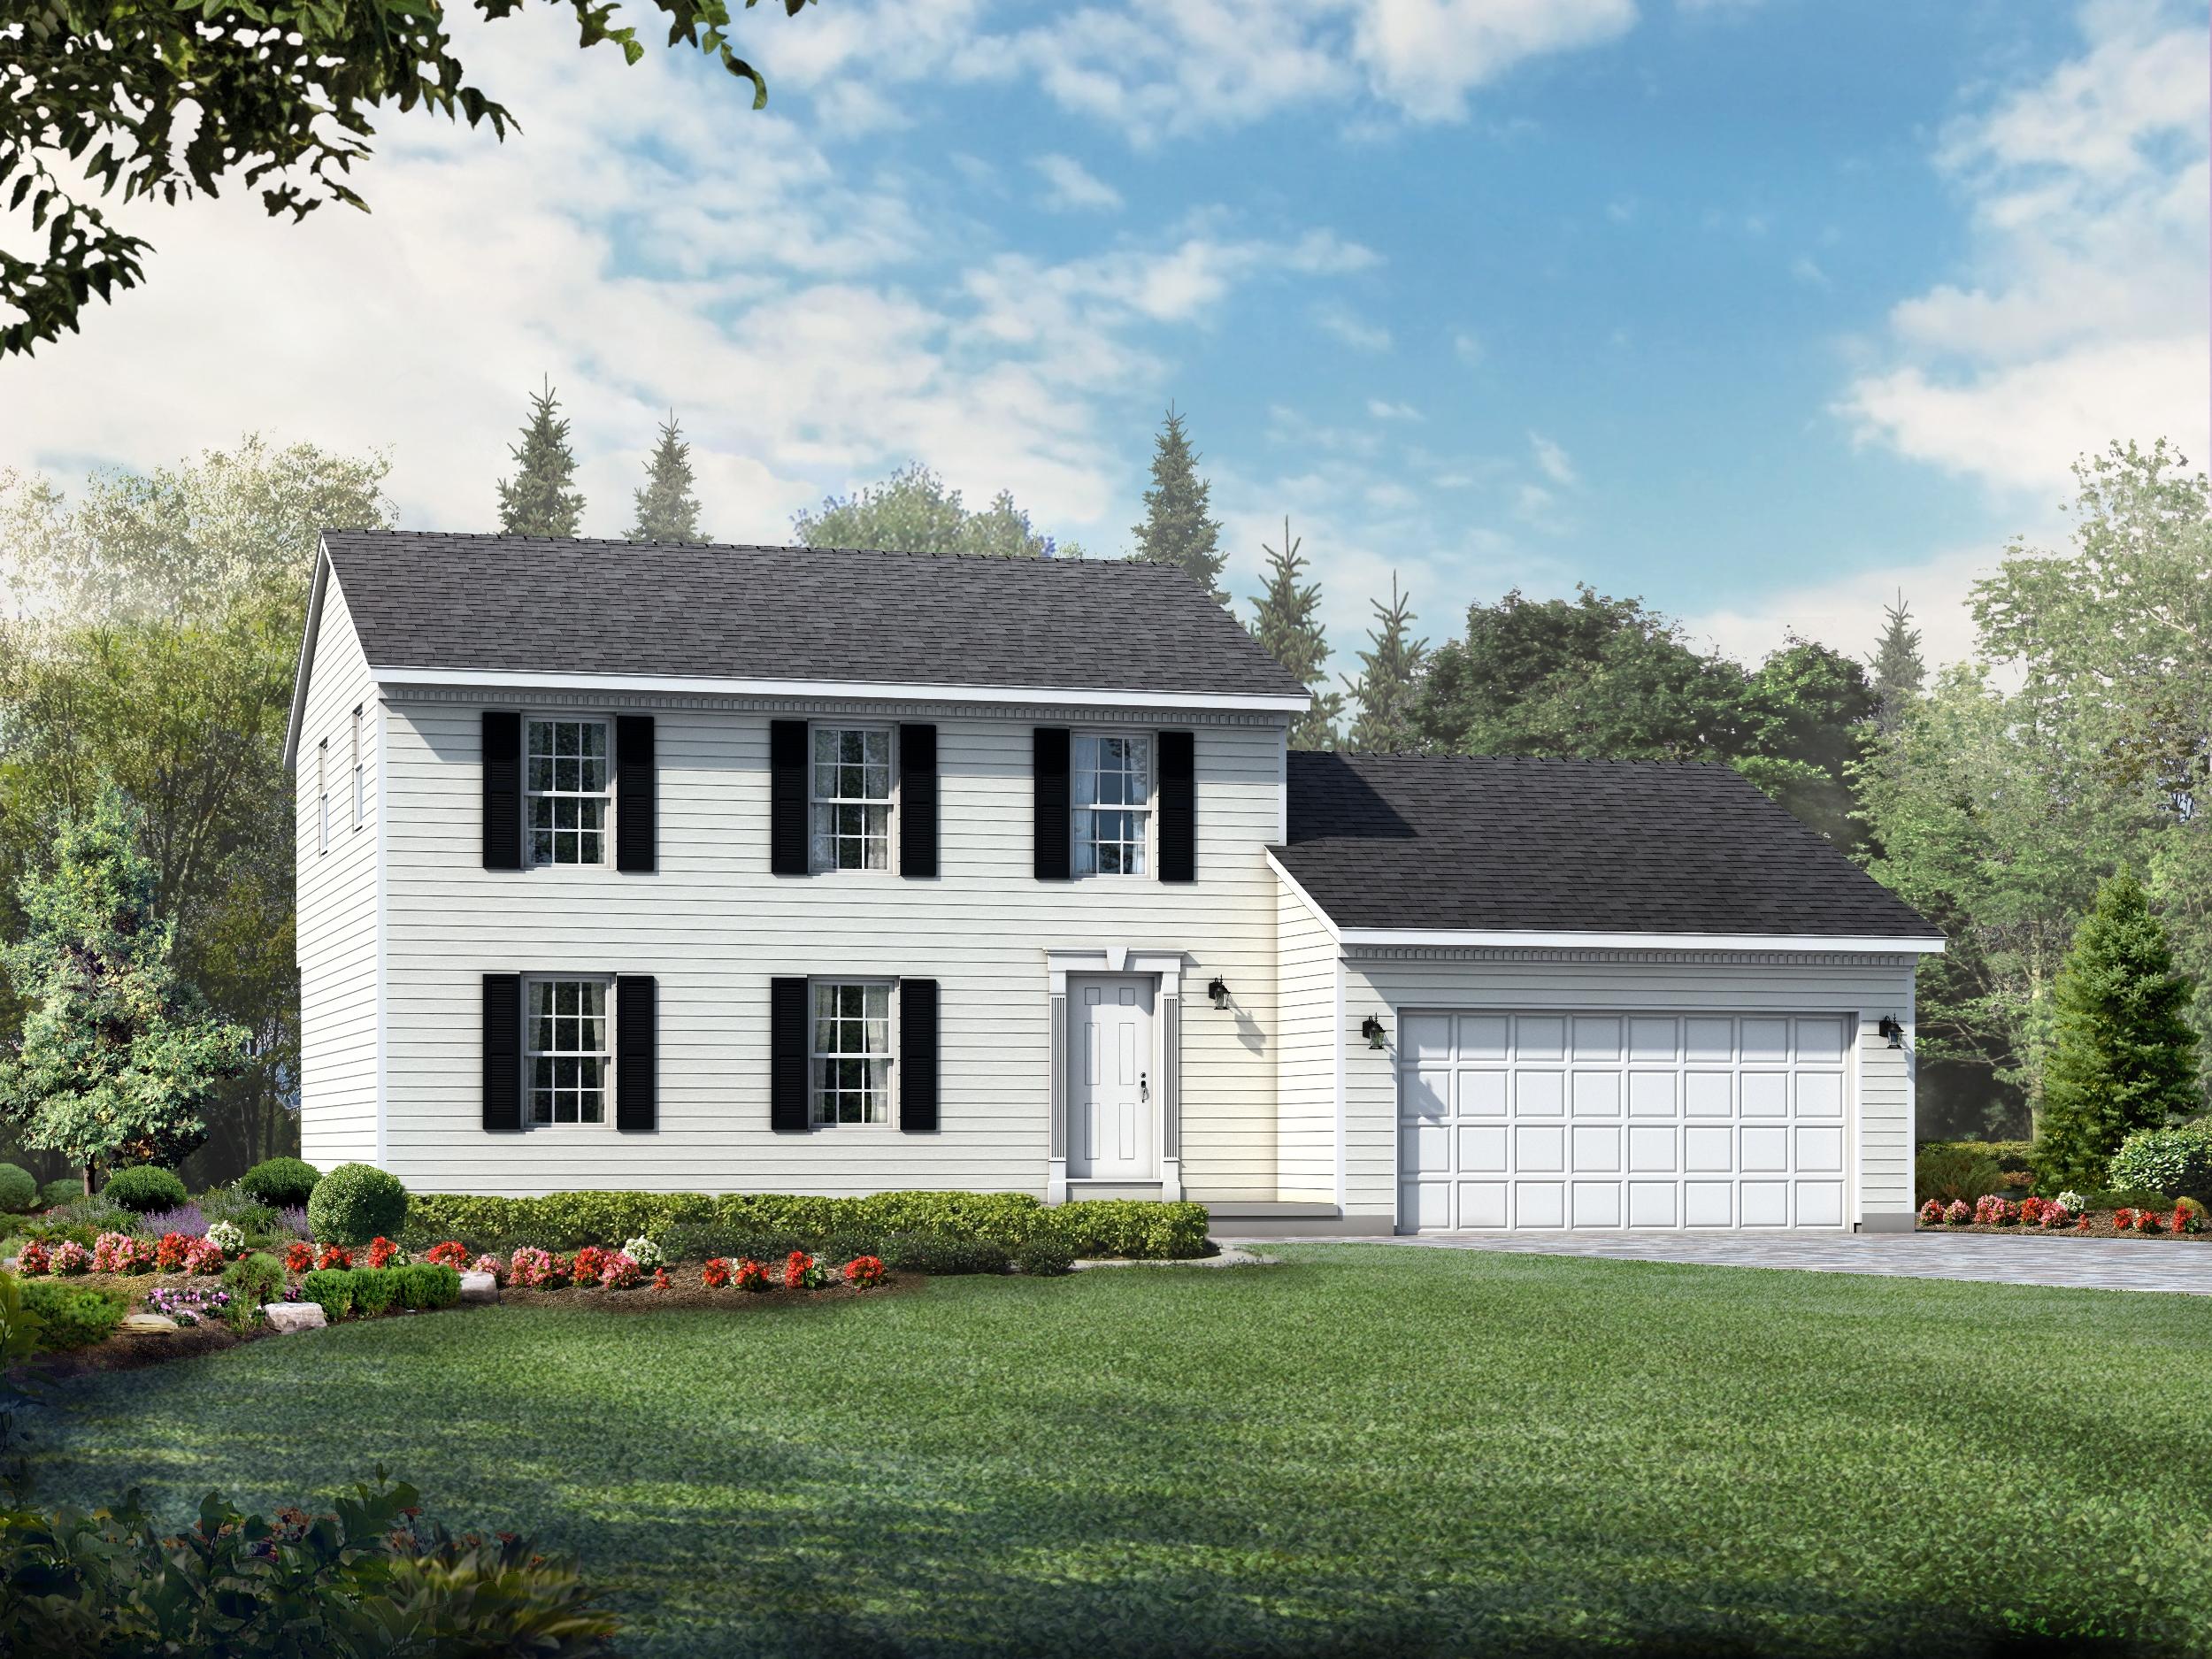 Custom Builder Wayne Homes Announces Release Of 2 New